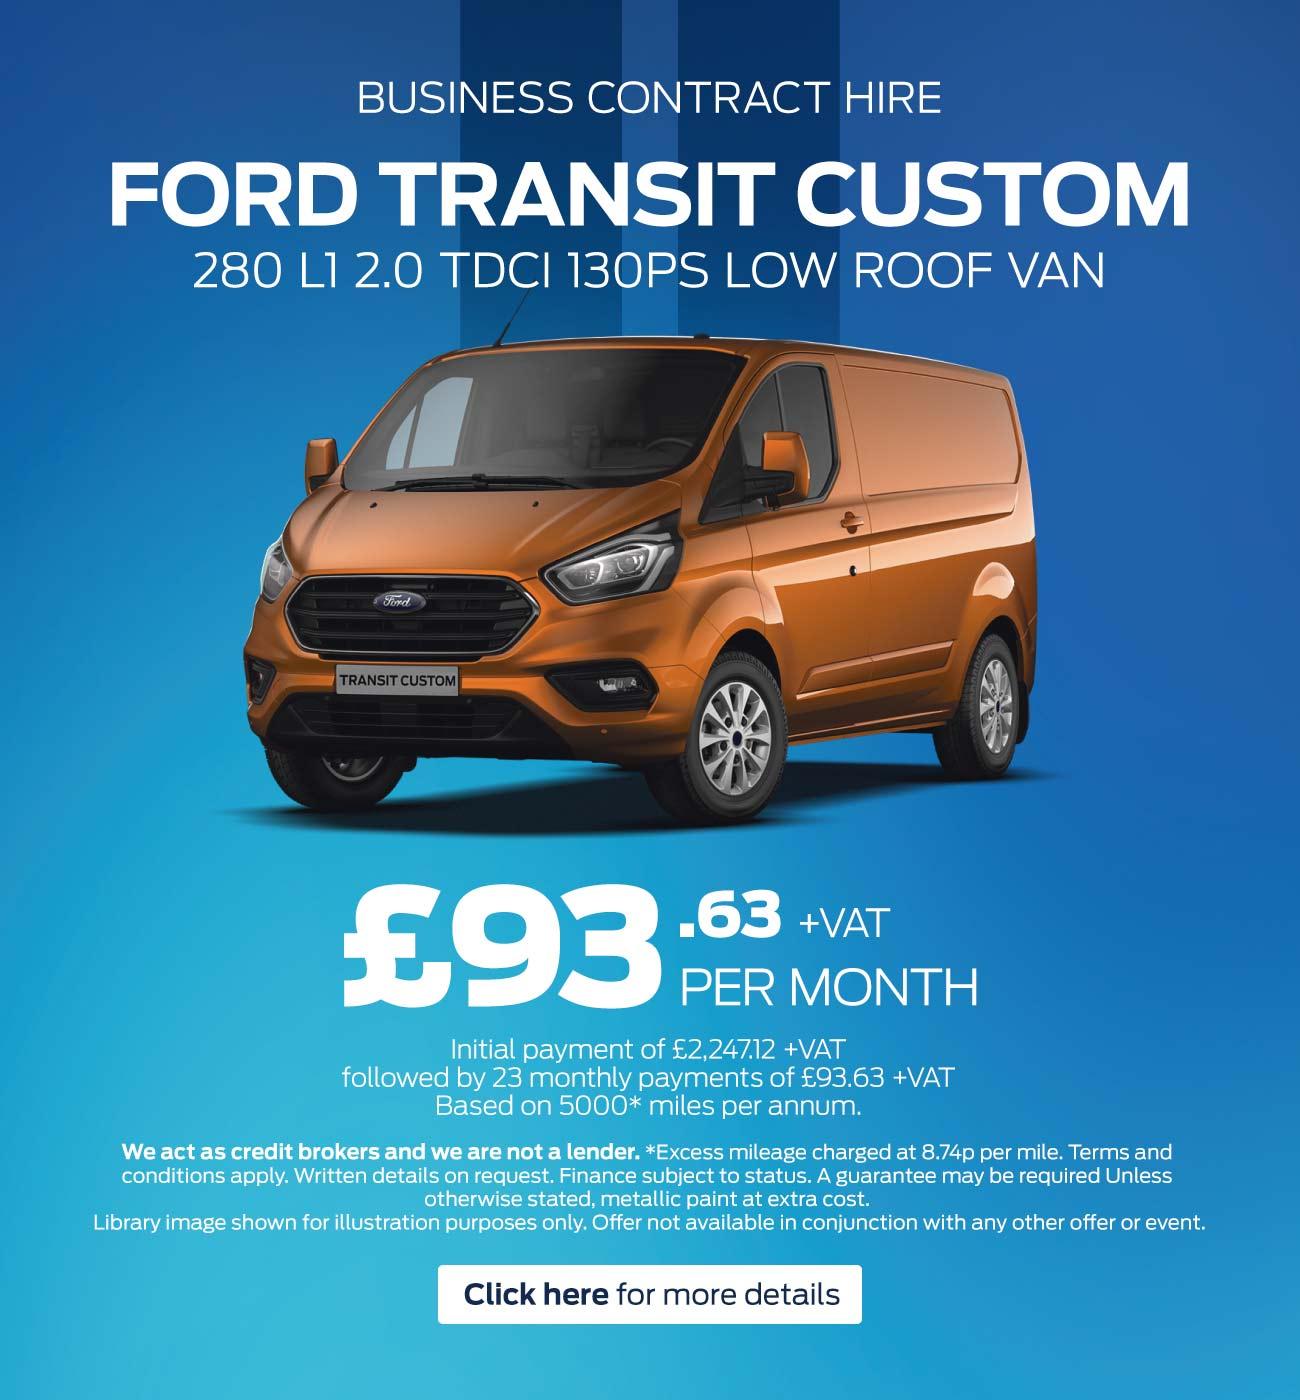 Dlm Camper Van 2017 Ford Transit Low Roof Low Mileage: New Ford Transit Custom Vans For Sale